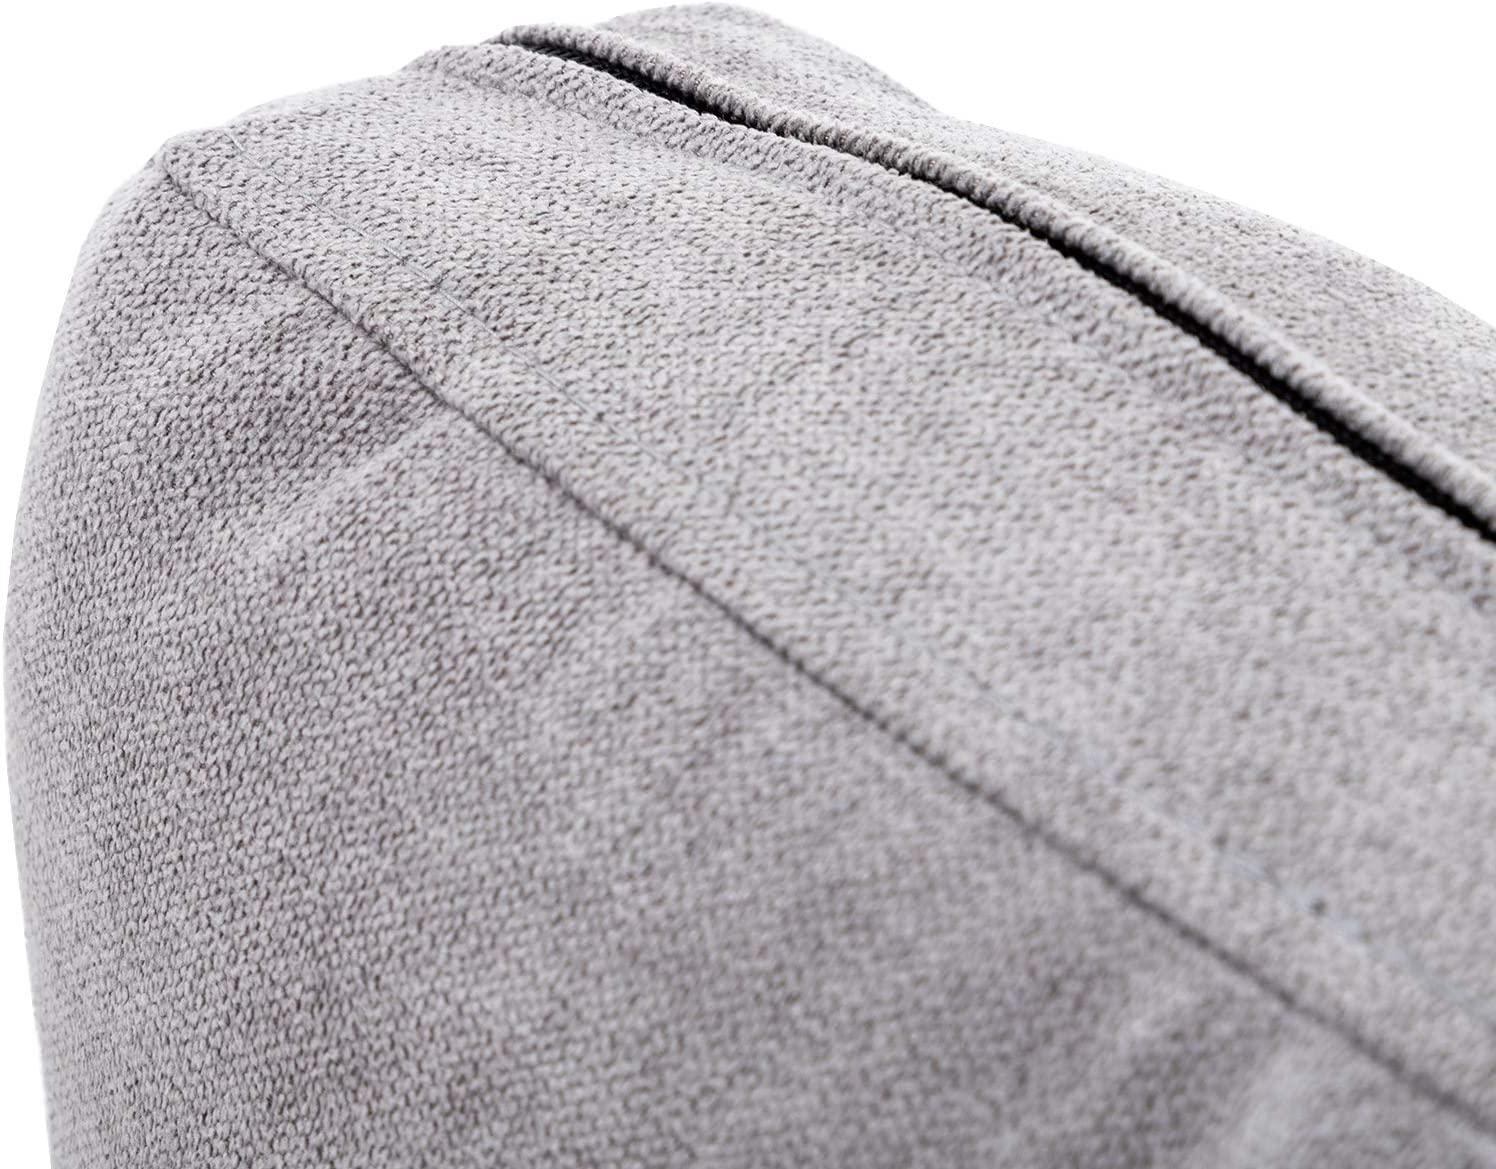 HONBAY Sofa Back Cushion Fully Expanded Cushion Fabric Sofa Pillows Beige